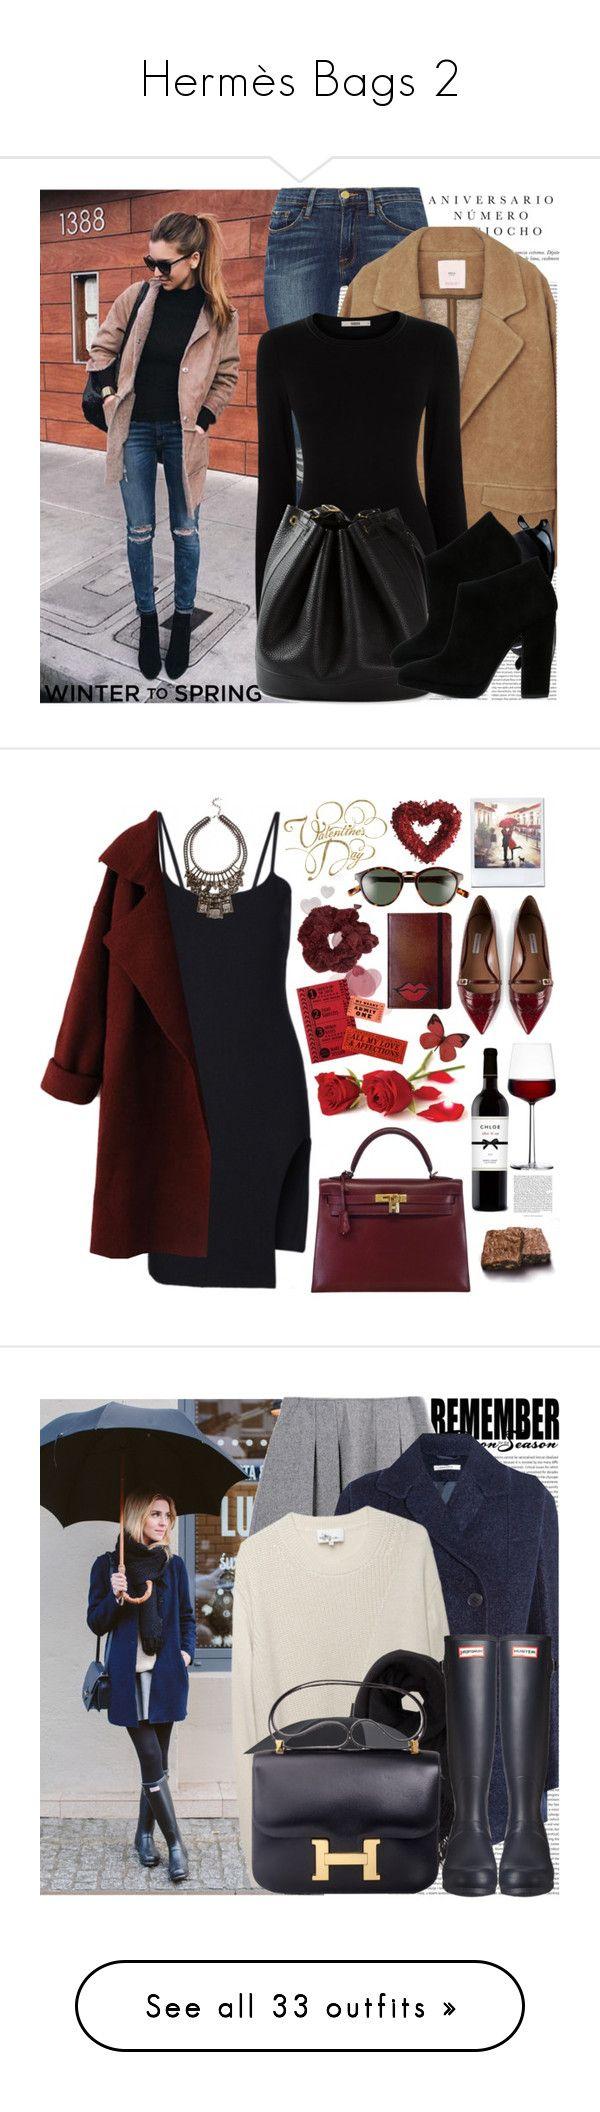 """Hermès Bags 2"" by chocolatepumma ❤ liked on Polyvore featuring Oris, Sinclair, Frame Denim, MANGO, Oasis, Hermès, Giuseppe Zanotti, Tabitha Simmons, iittala and Polaroid Eyewear"